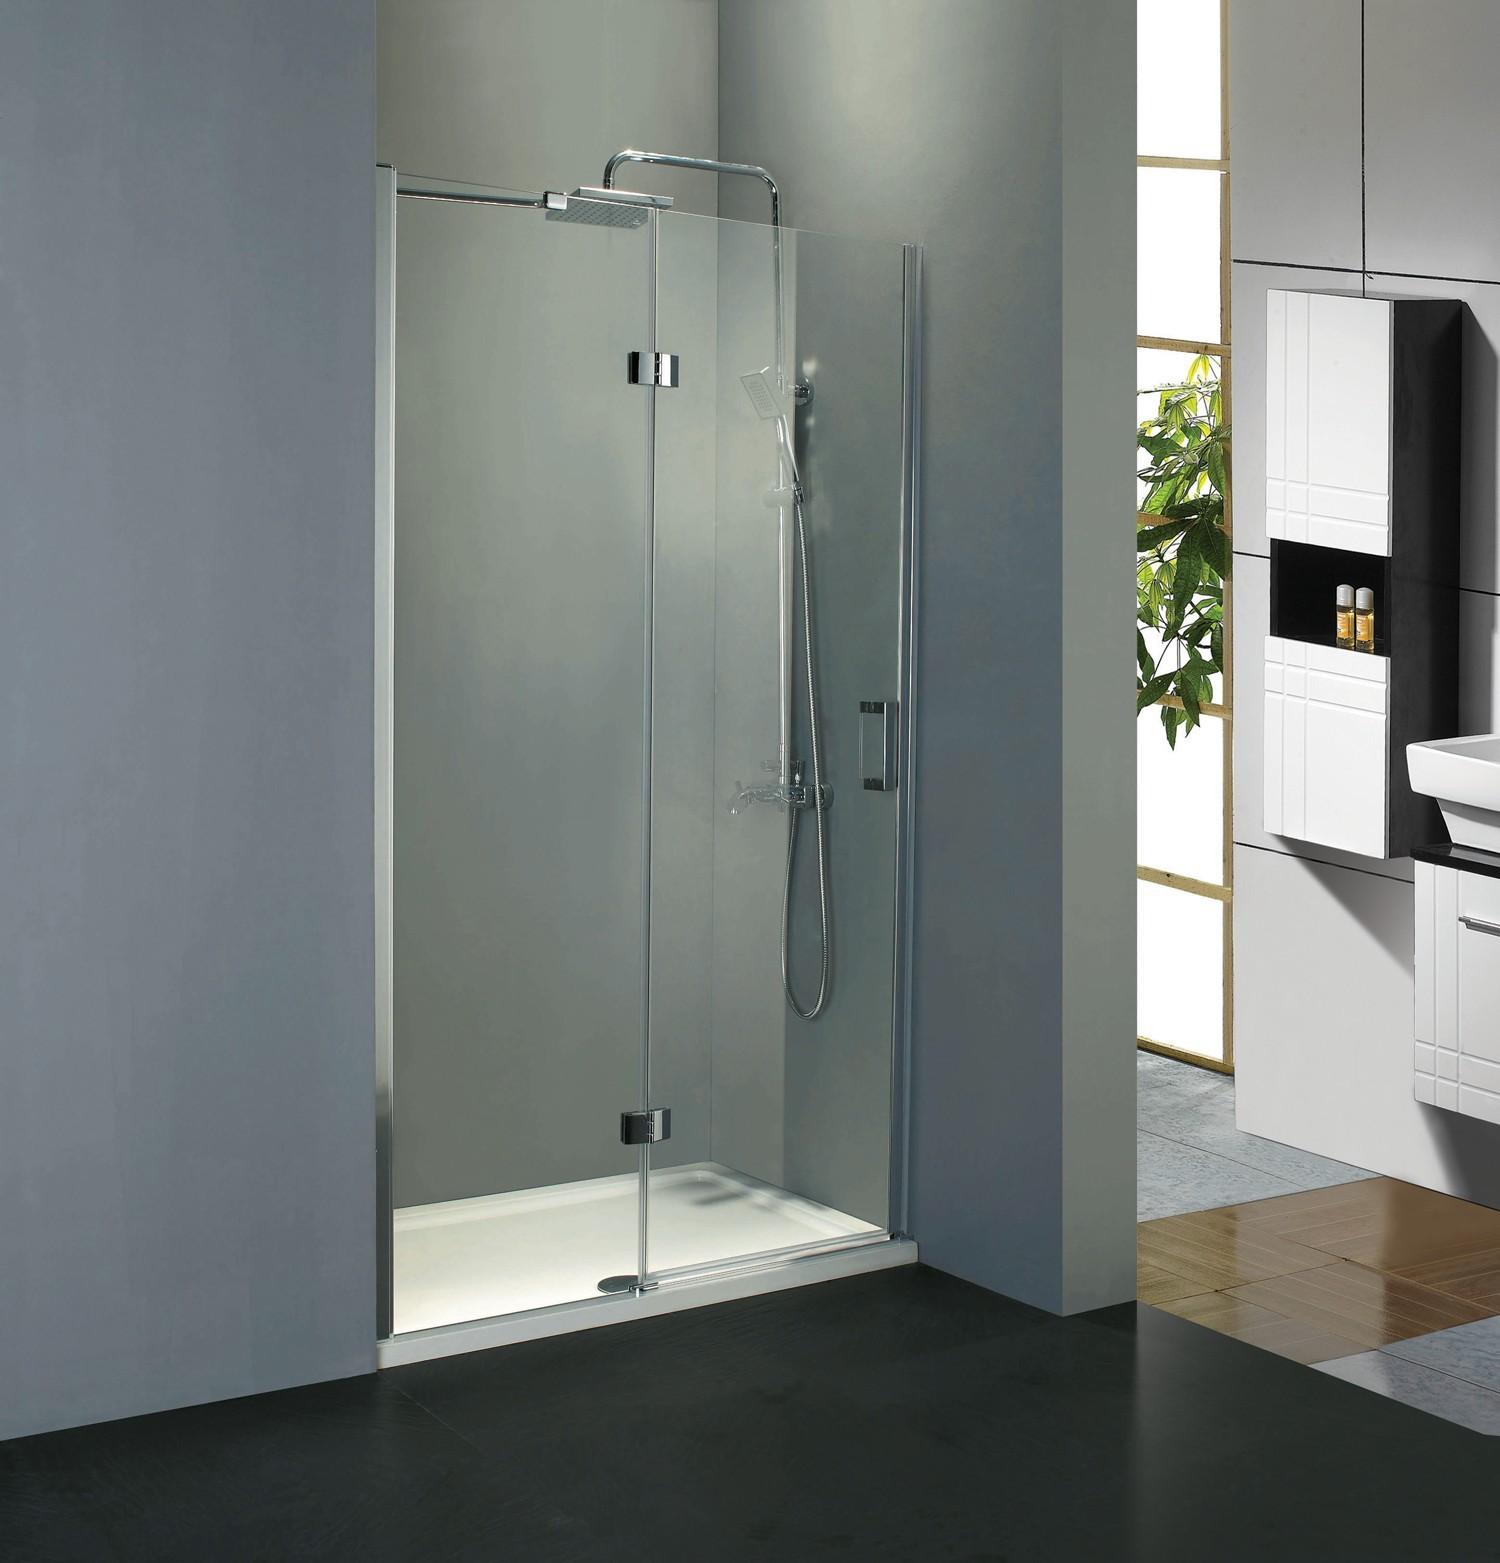 https://www.tegelensanitairmagazijn.nl/9250/Beuhmer-mauer-draaideur-100x200-cm-chroom-6-mm-dik-helder-glas.jpg